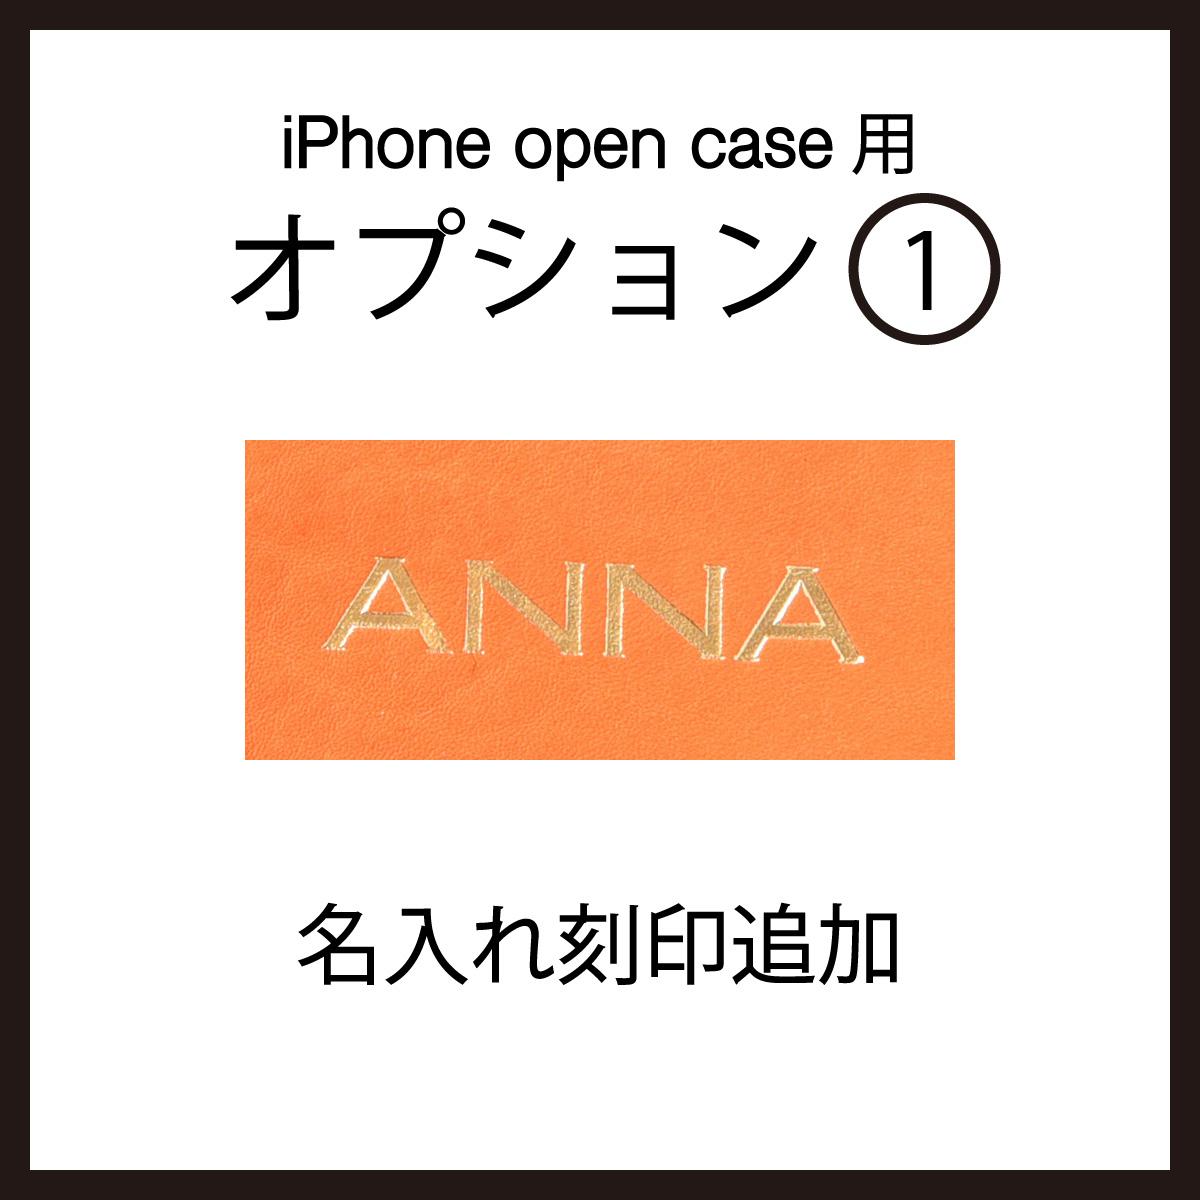 iPhoneオープンケース用 追加オプション オプション:1 お求めやすく価格改定 名入れ刻印追加 2020新作